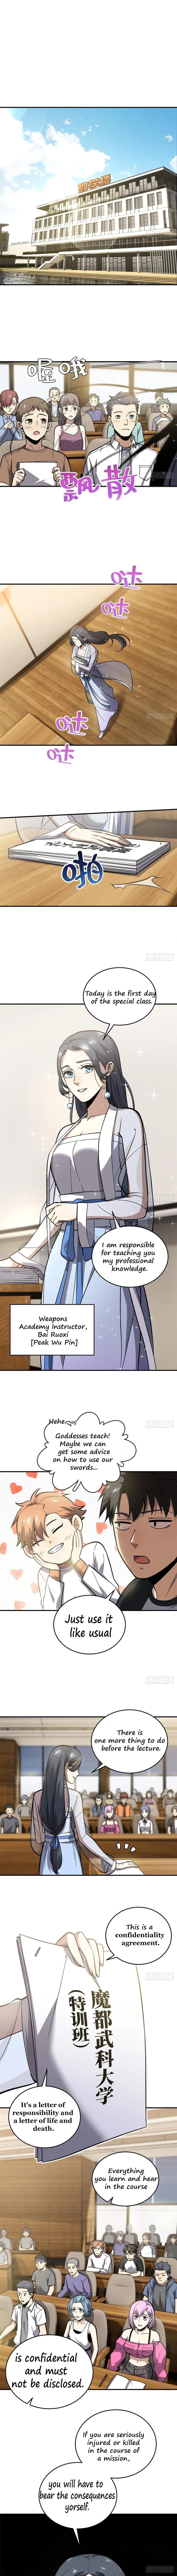 Manga Global Martial Arts - Chapter 56 Page 1